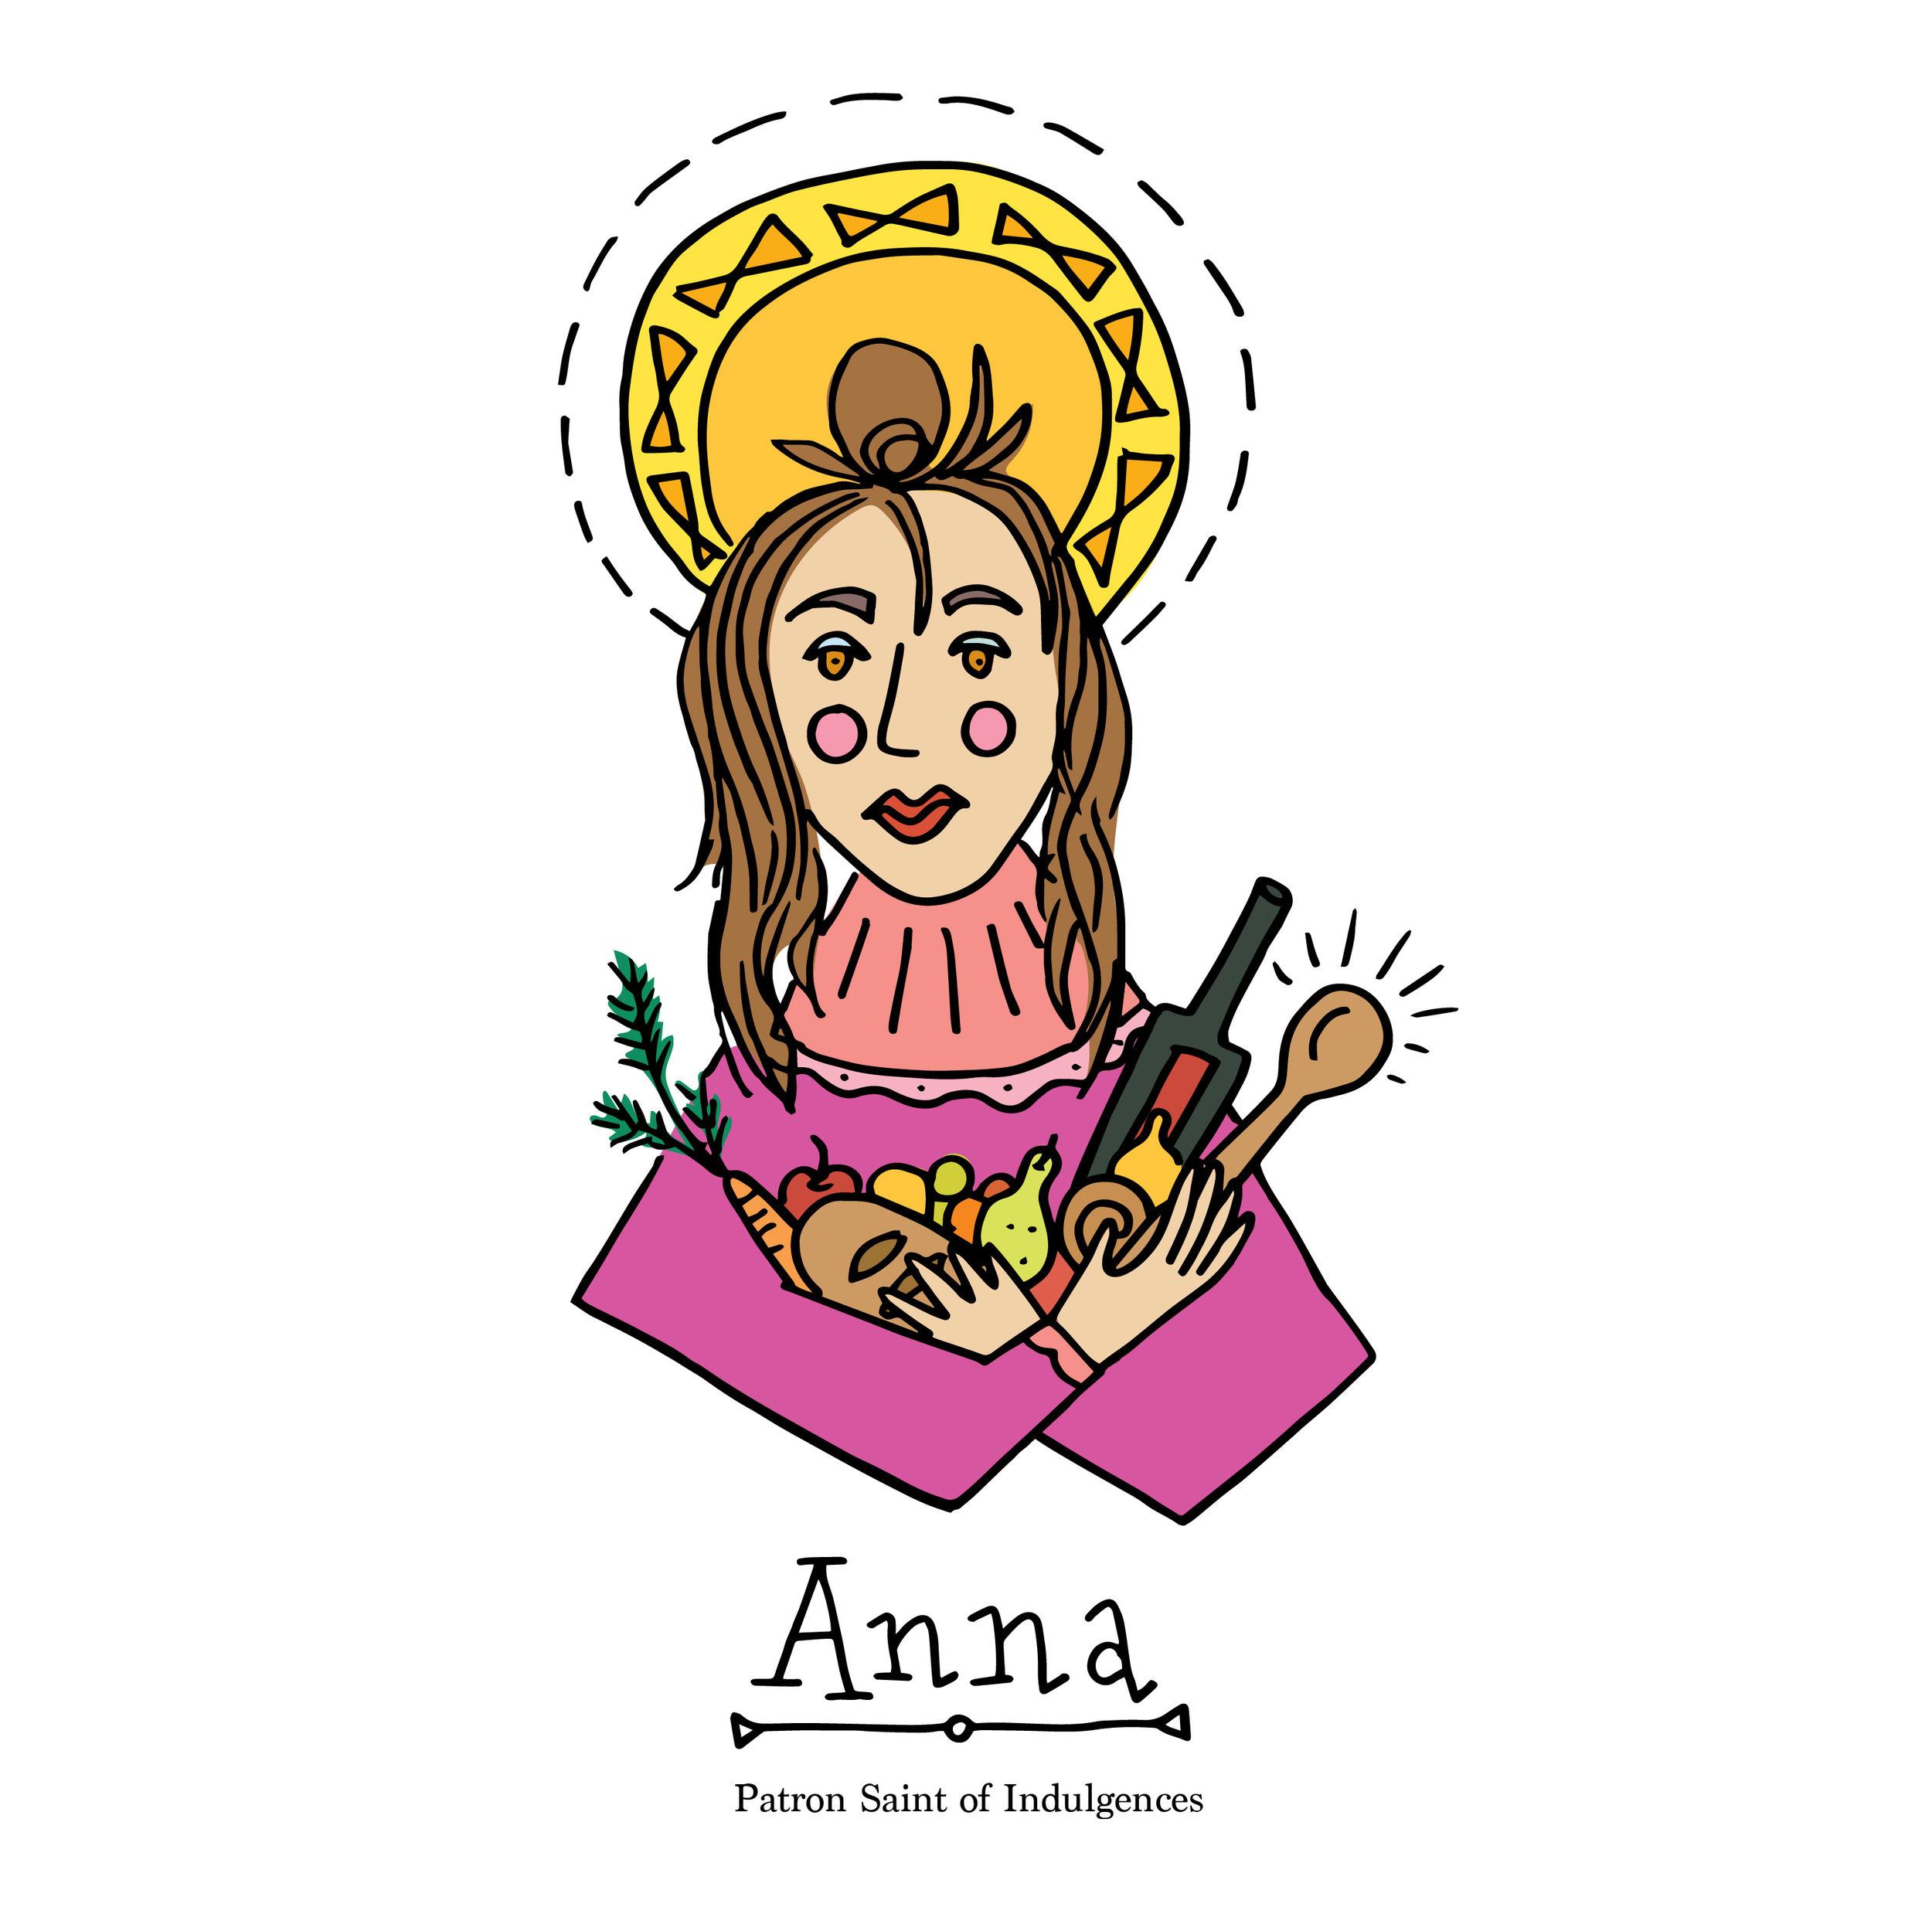 Saints_Anna.jpg